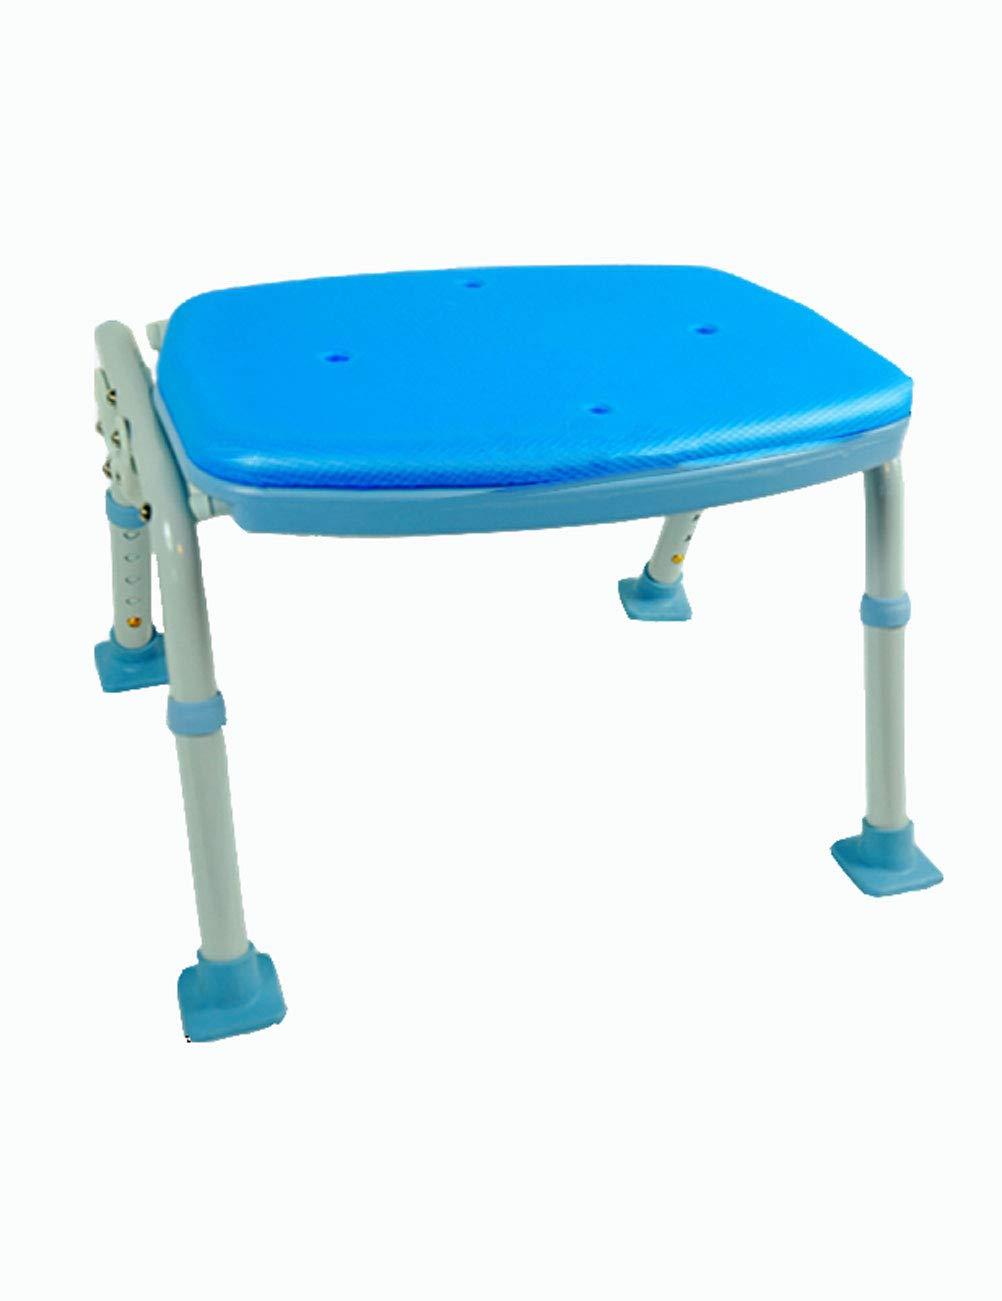 TLMY Thick Aluminum Shower Chair Old Man Shower Stool Bathroom Stool Pregnant Women Anti-Skid Bath Stool Folding Chair Shower Chair